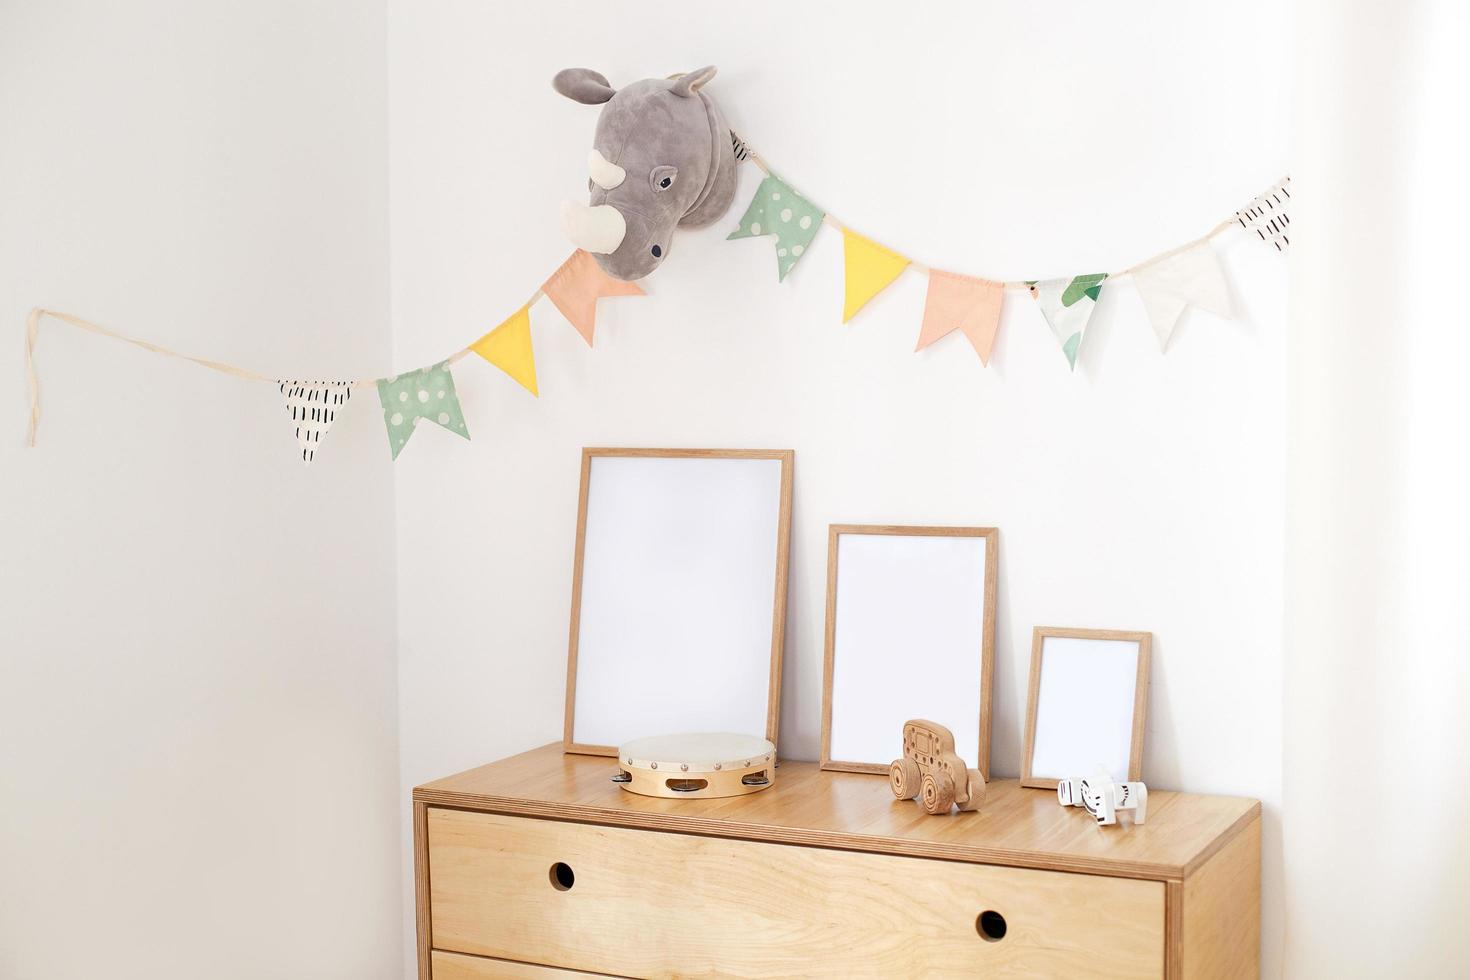 trä eco leksaker i barns rum foto